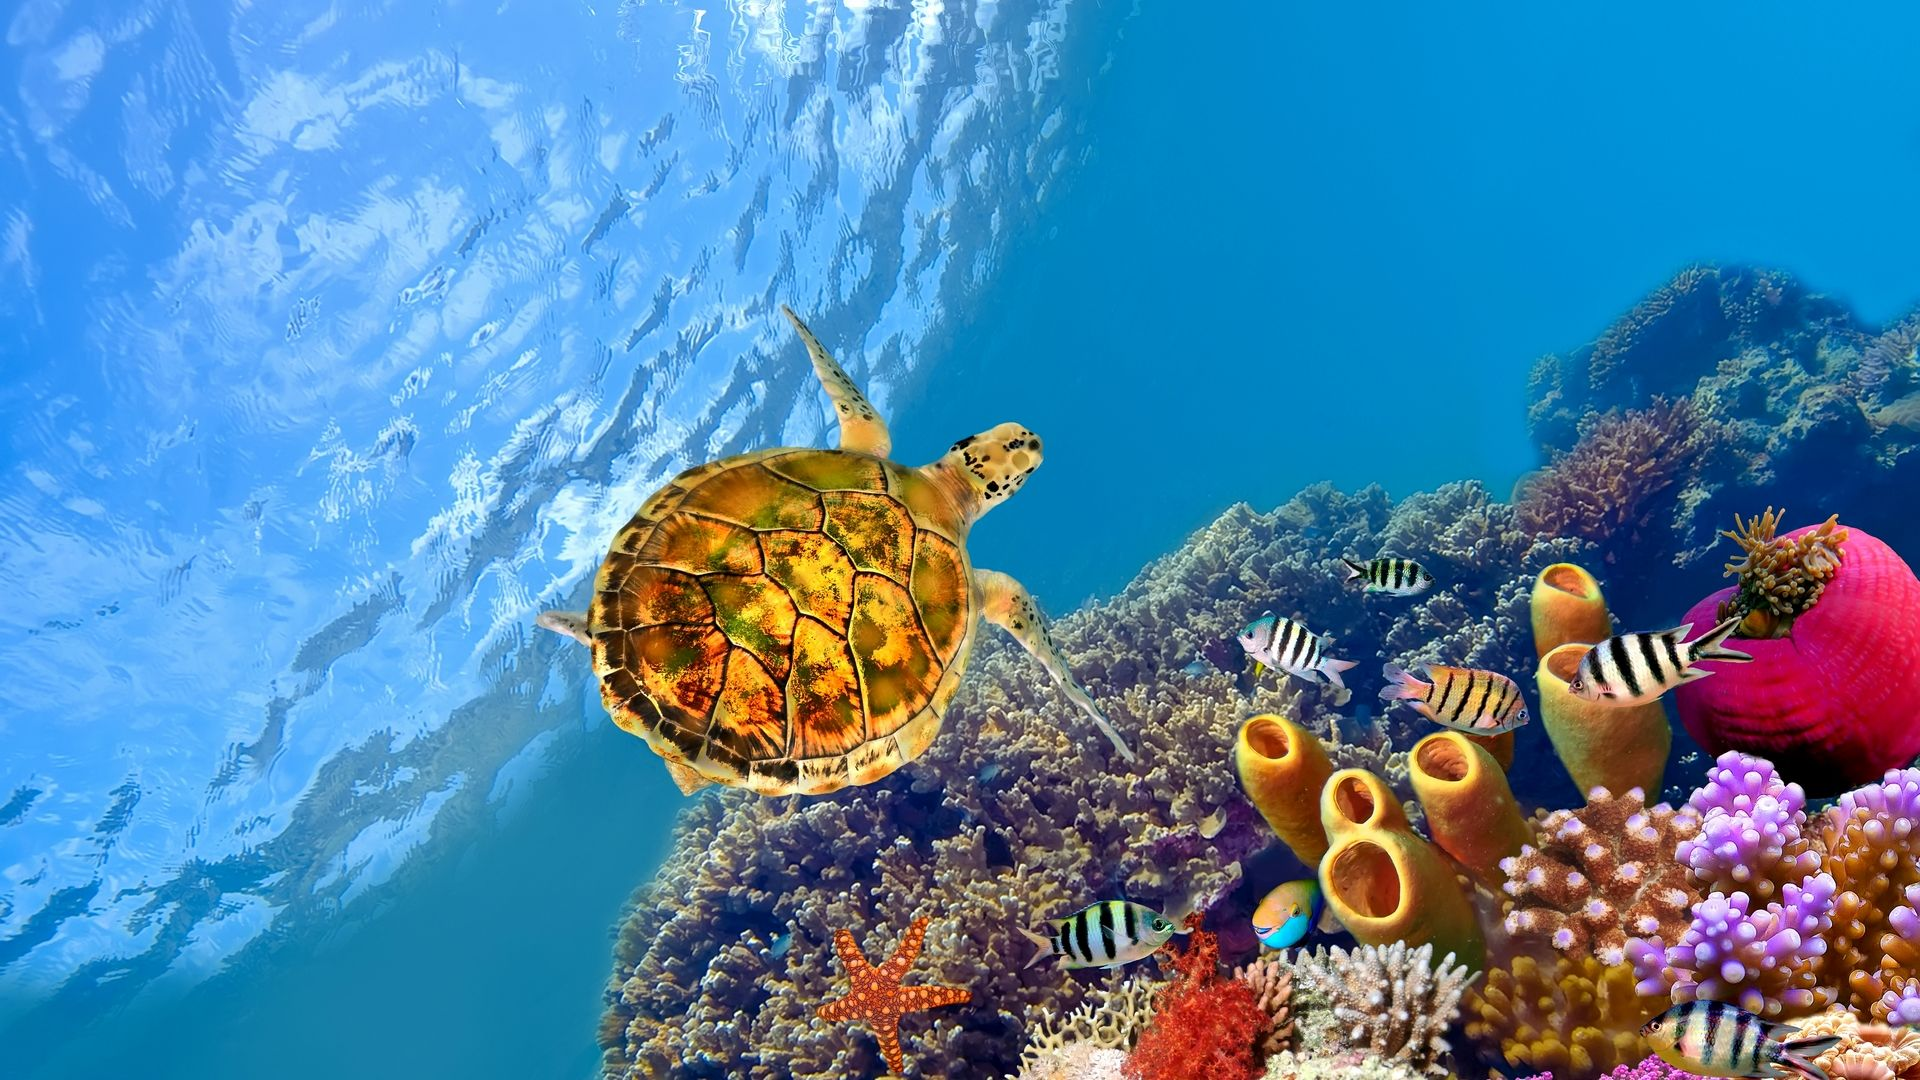 Free Desktop Wallpaper Windows Underwater Wallpaper Turtle Wallpaper Hd Wallpaper